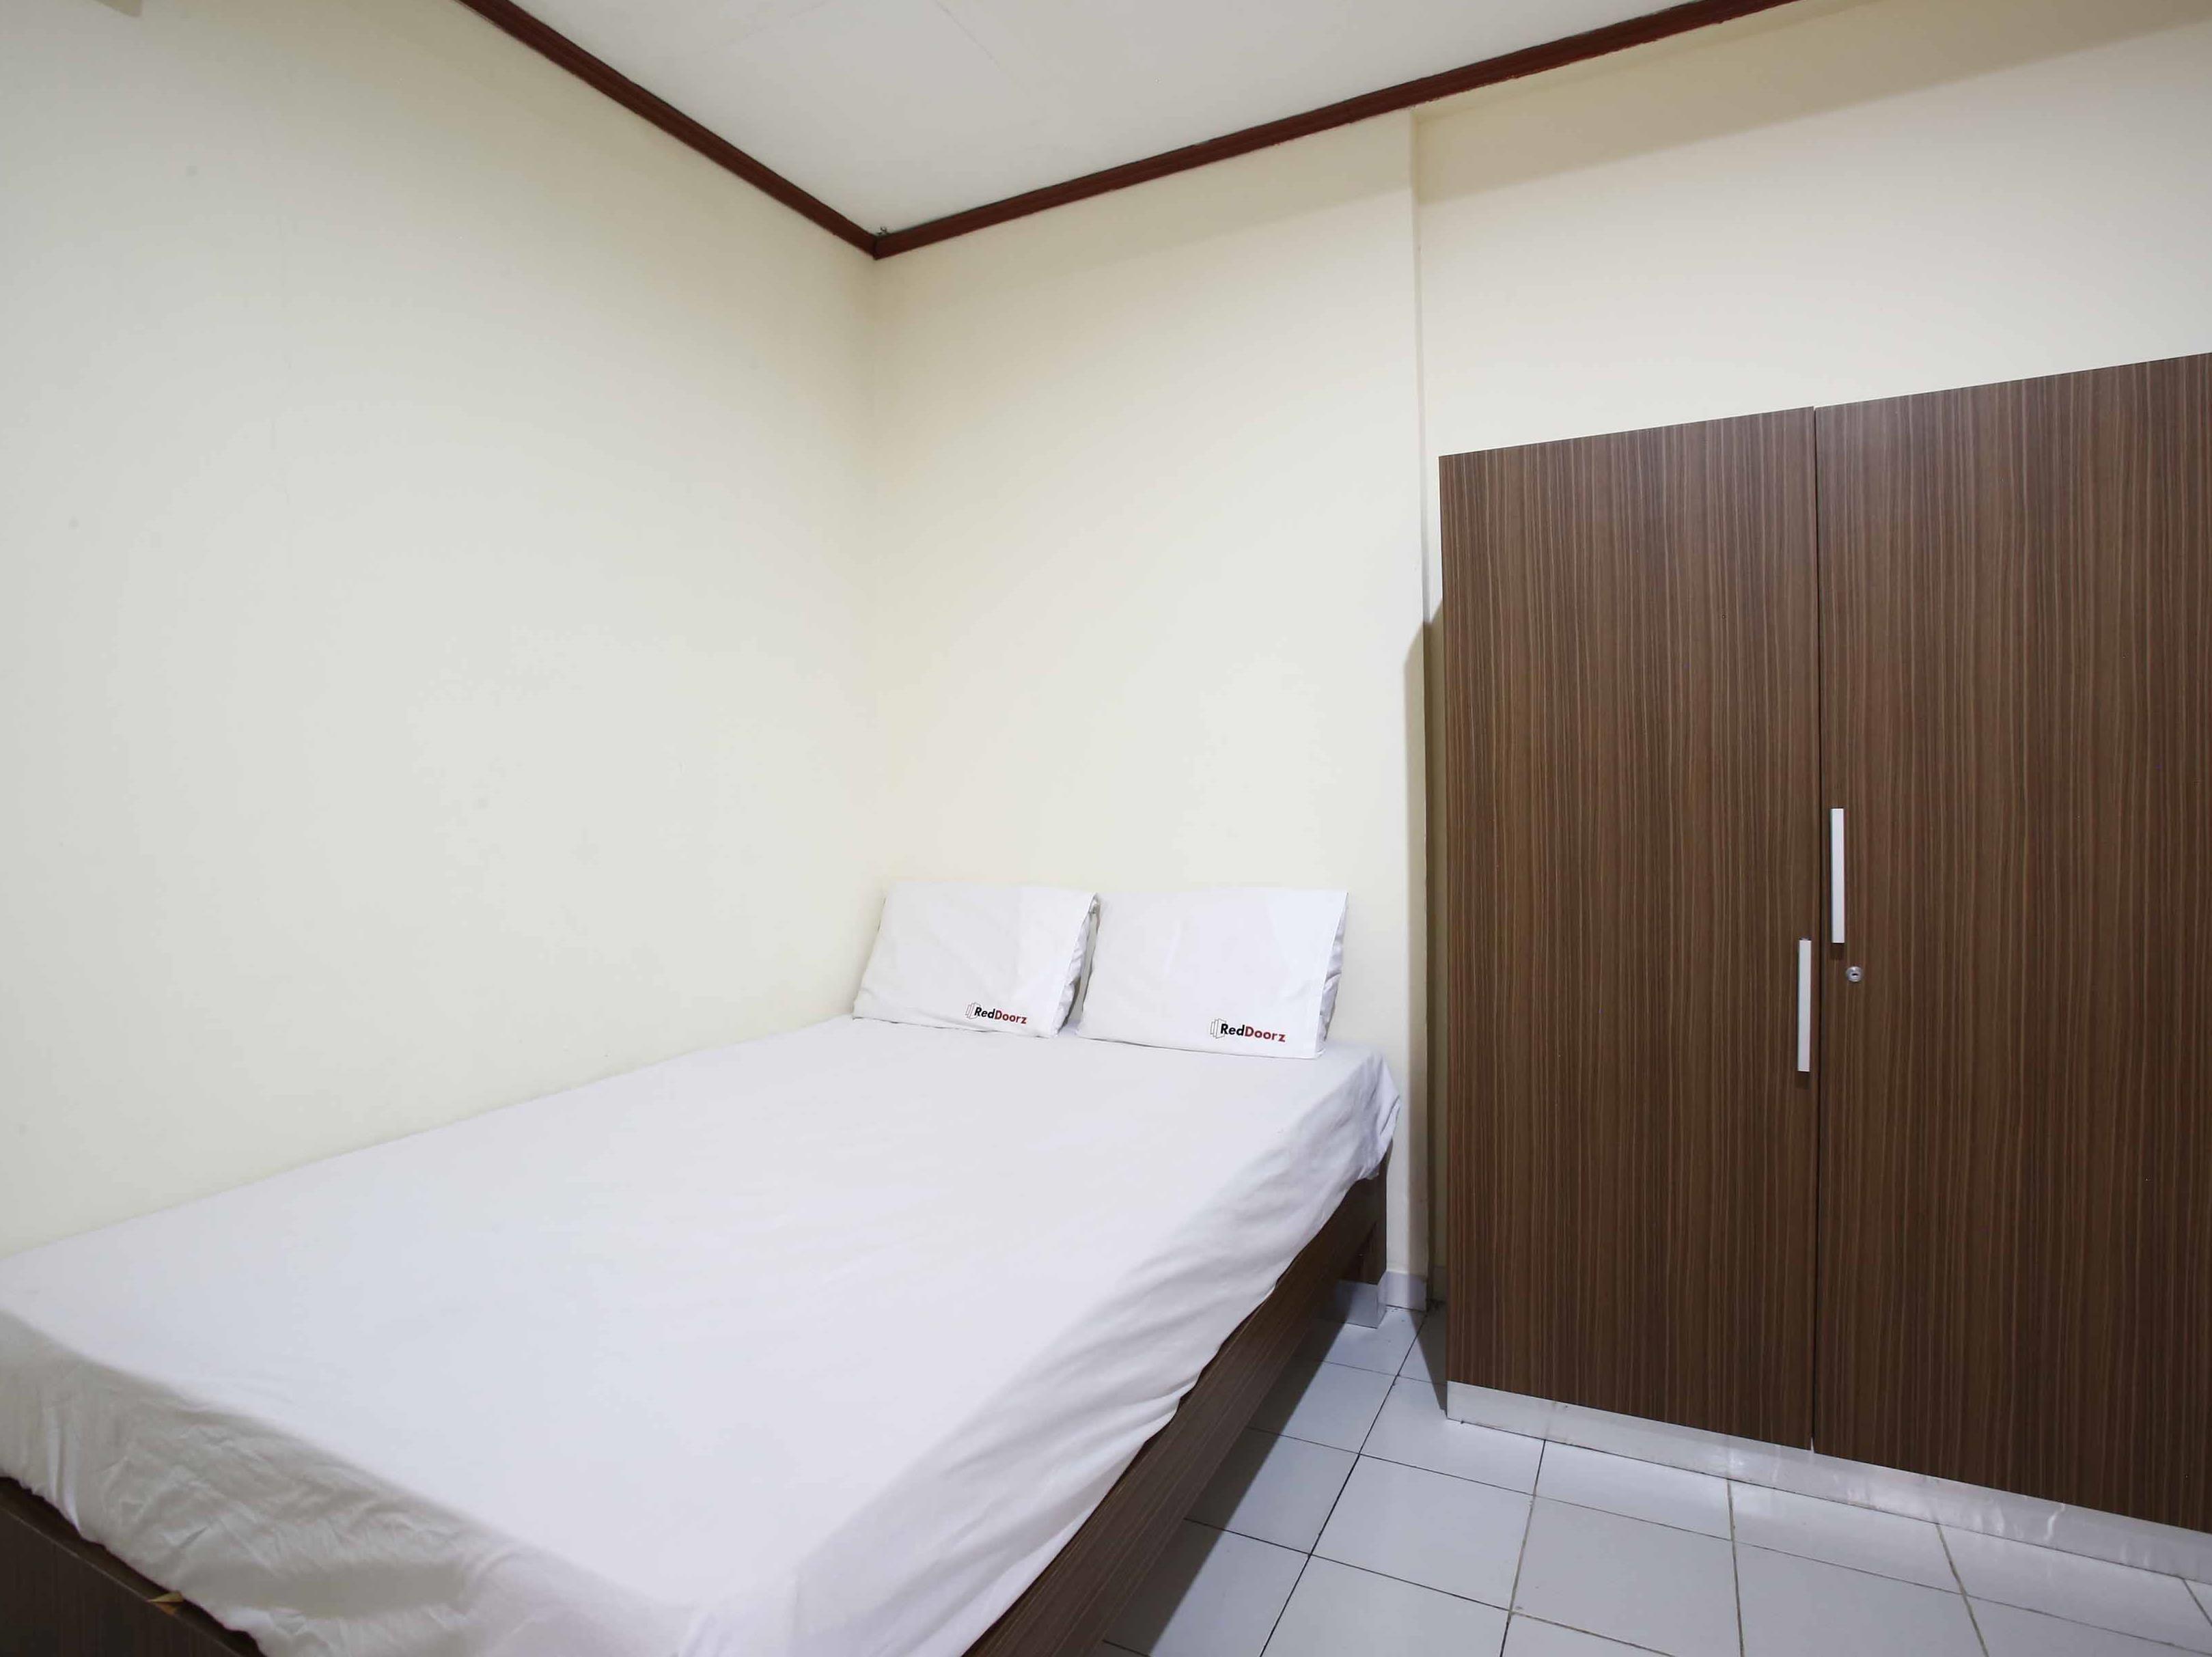 RedDoorz @ Mampang 23 Jakarta, Indonesia